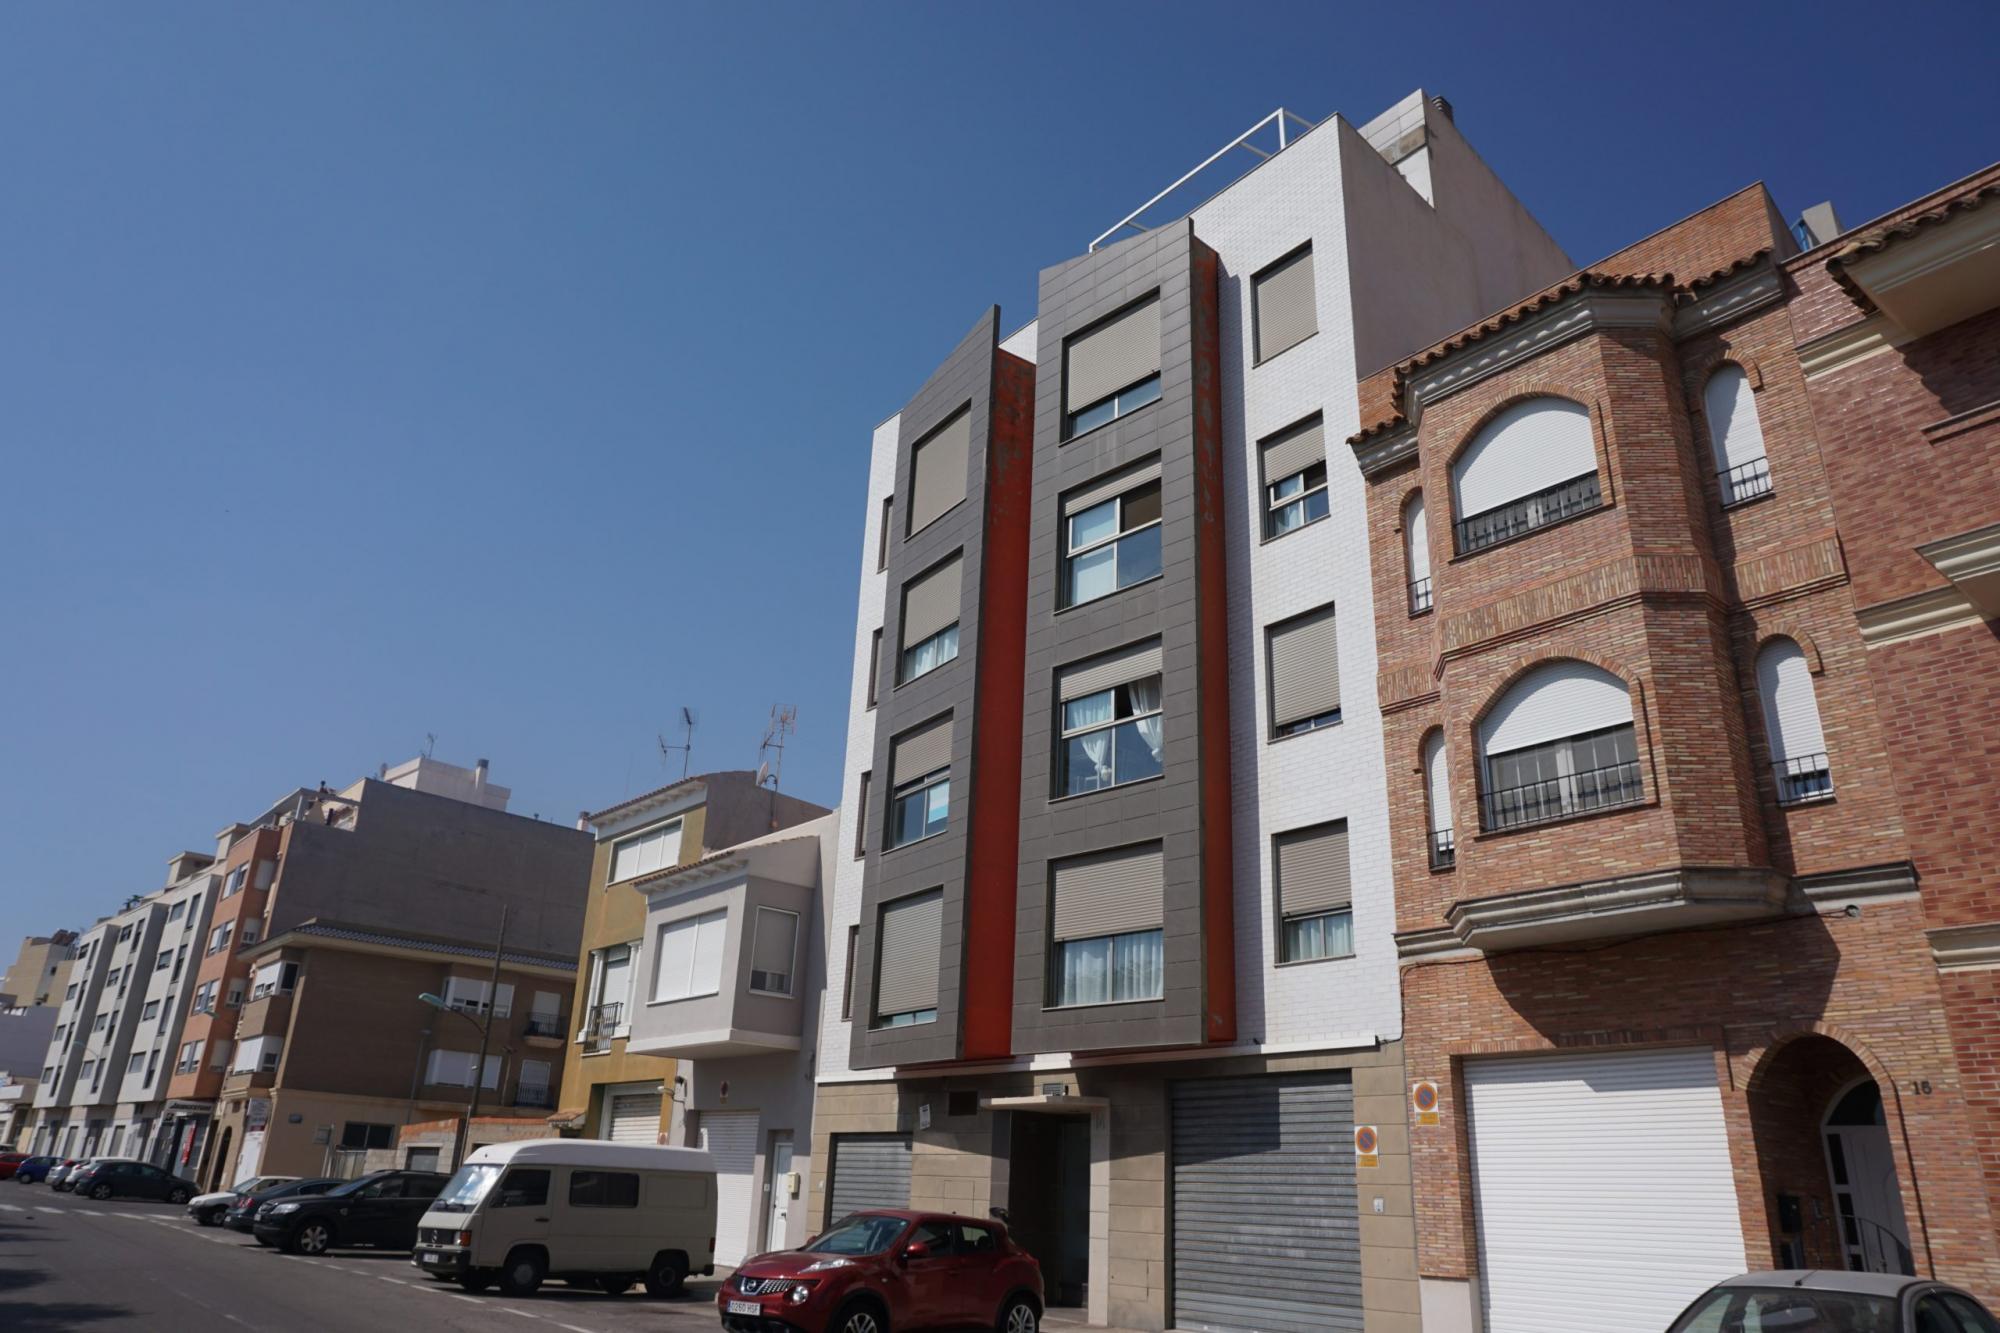 Piso en venta en Burriana (Castellón) zona Río